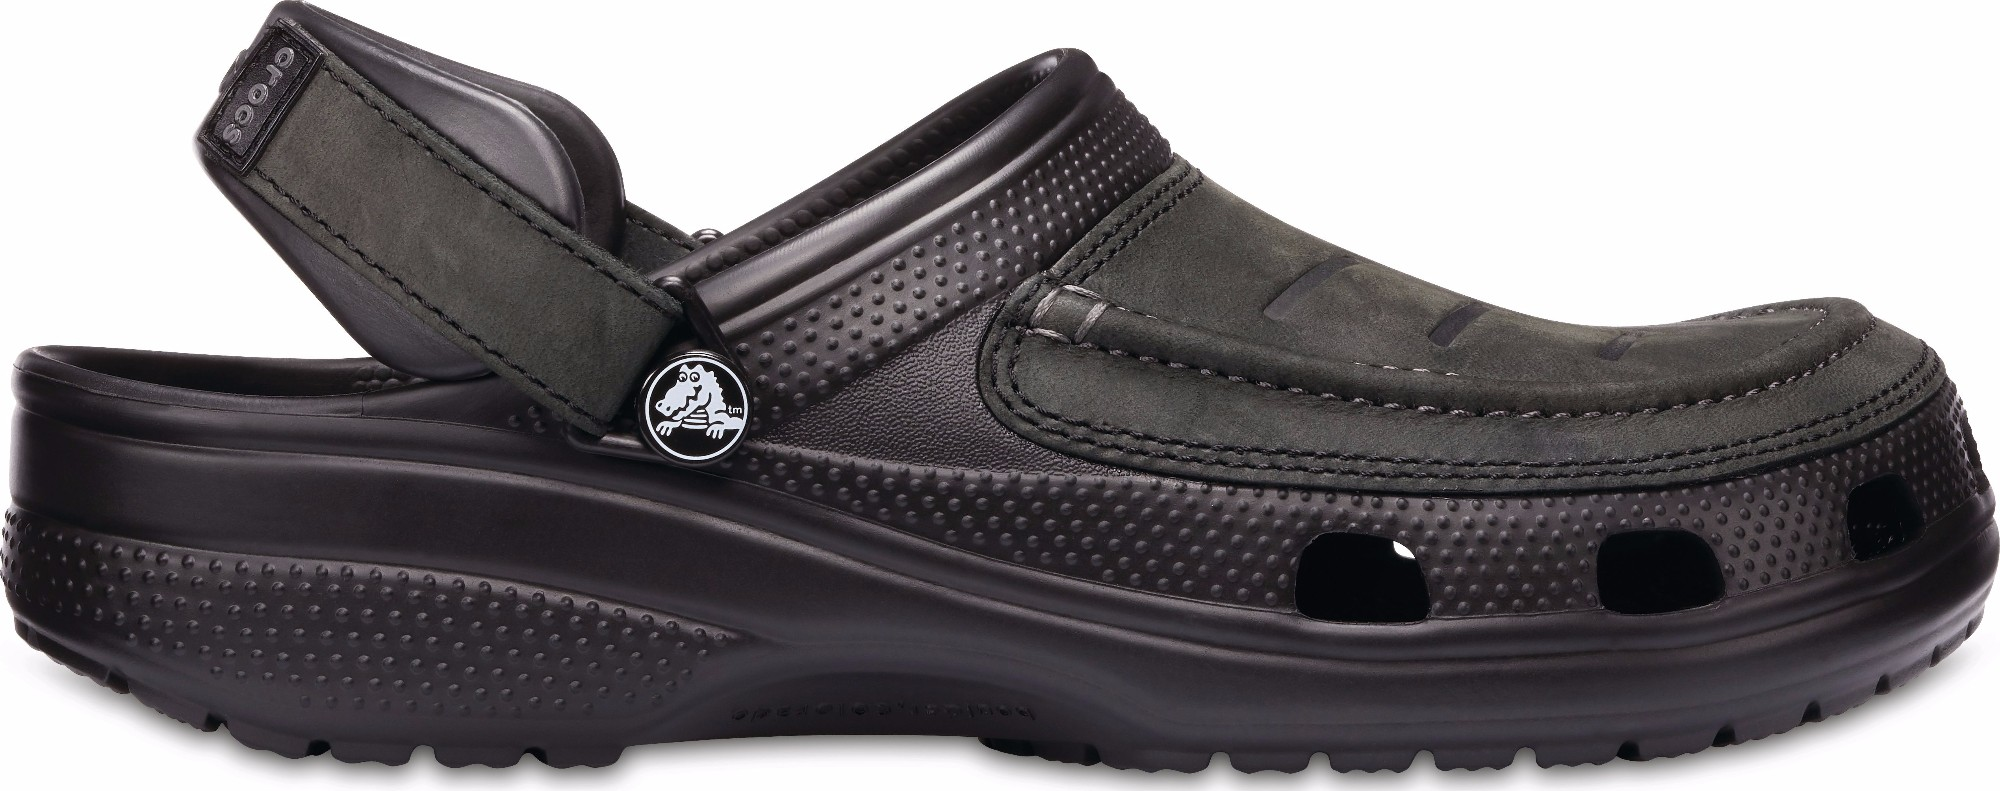 Crocs™ Yukon Vista Clog Black/Black 44,5